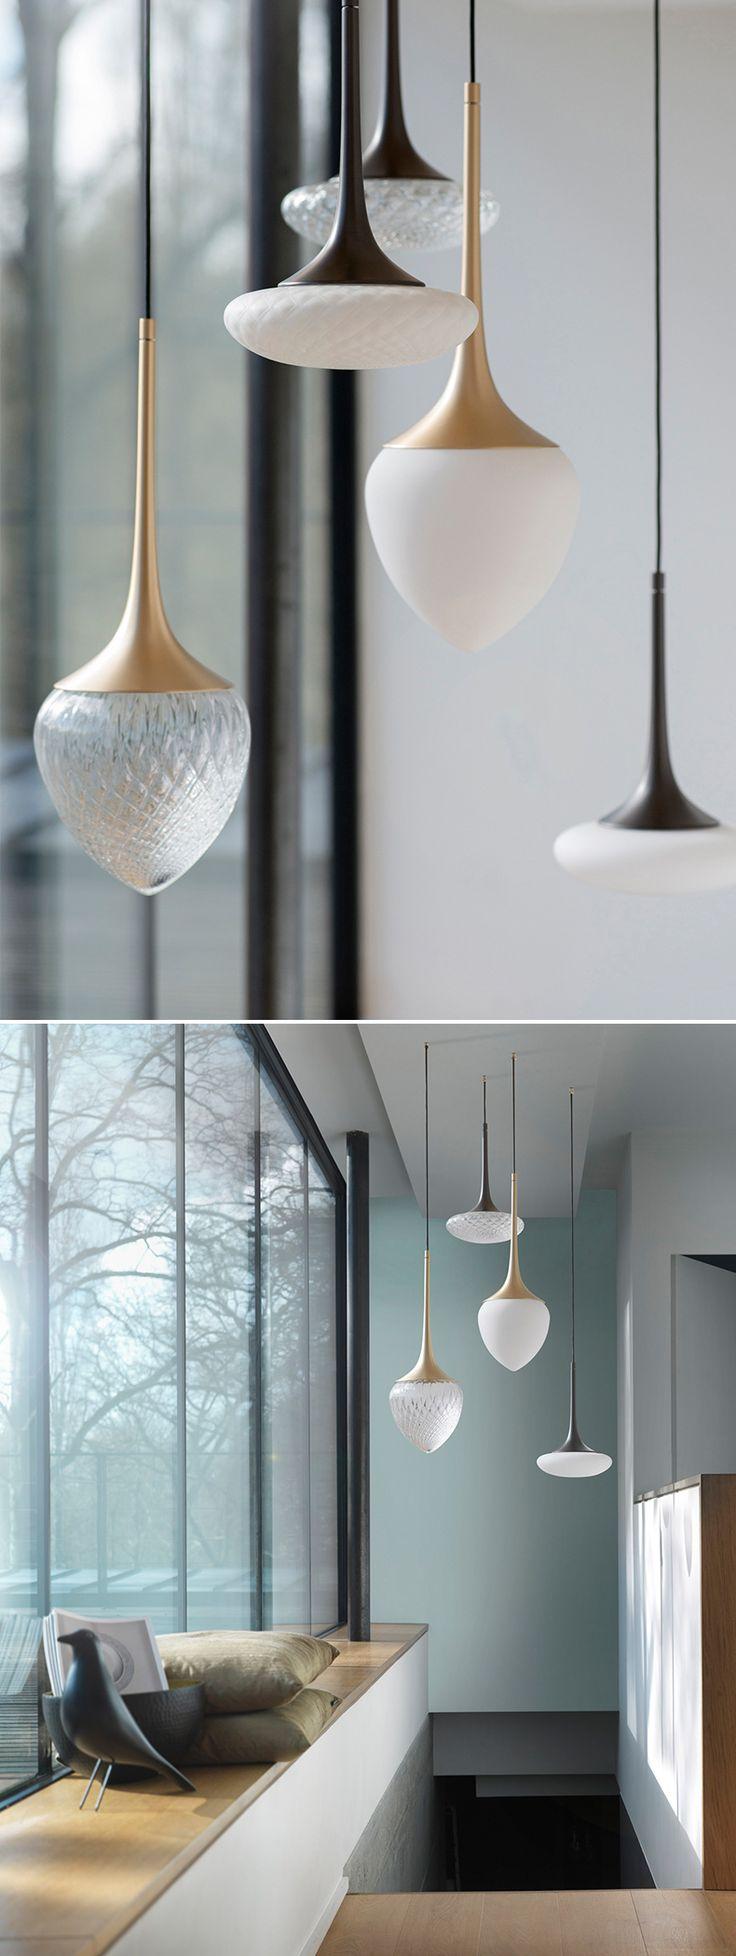 Interior Design Blog   Introducing The Adaptable Designs Of CVL Luminaires  | Haute Living